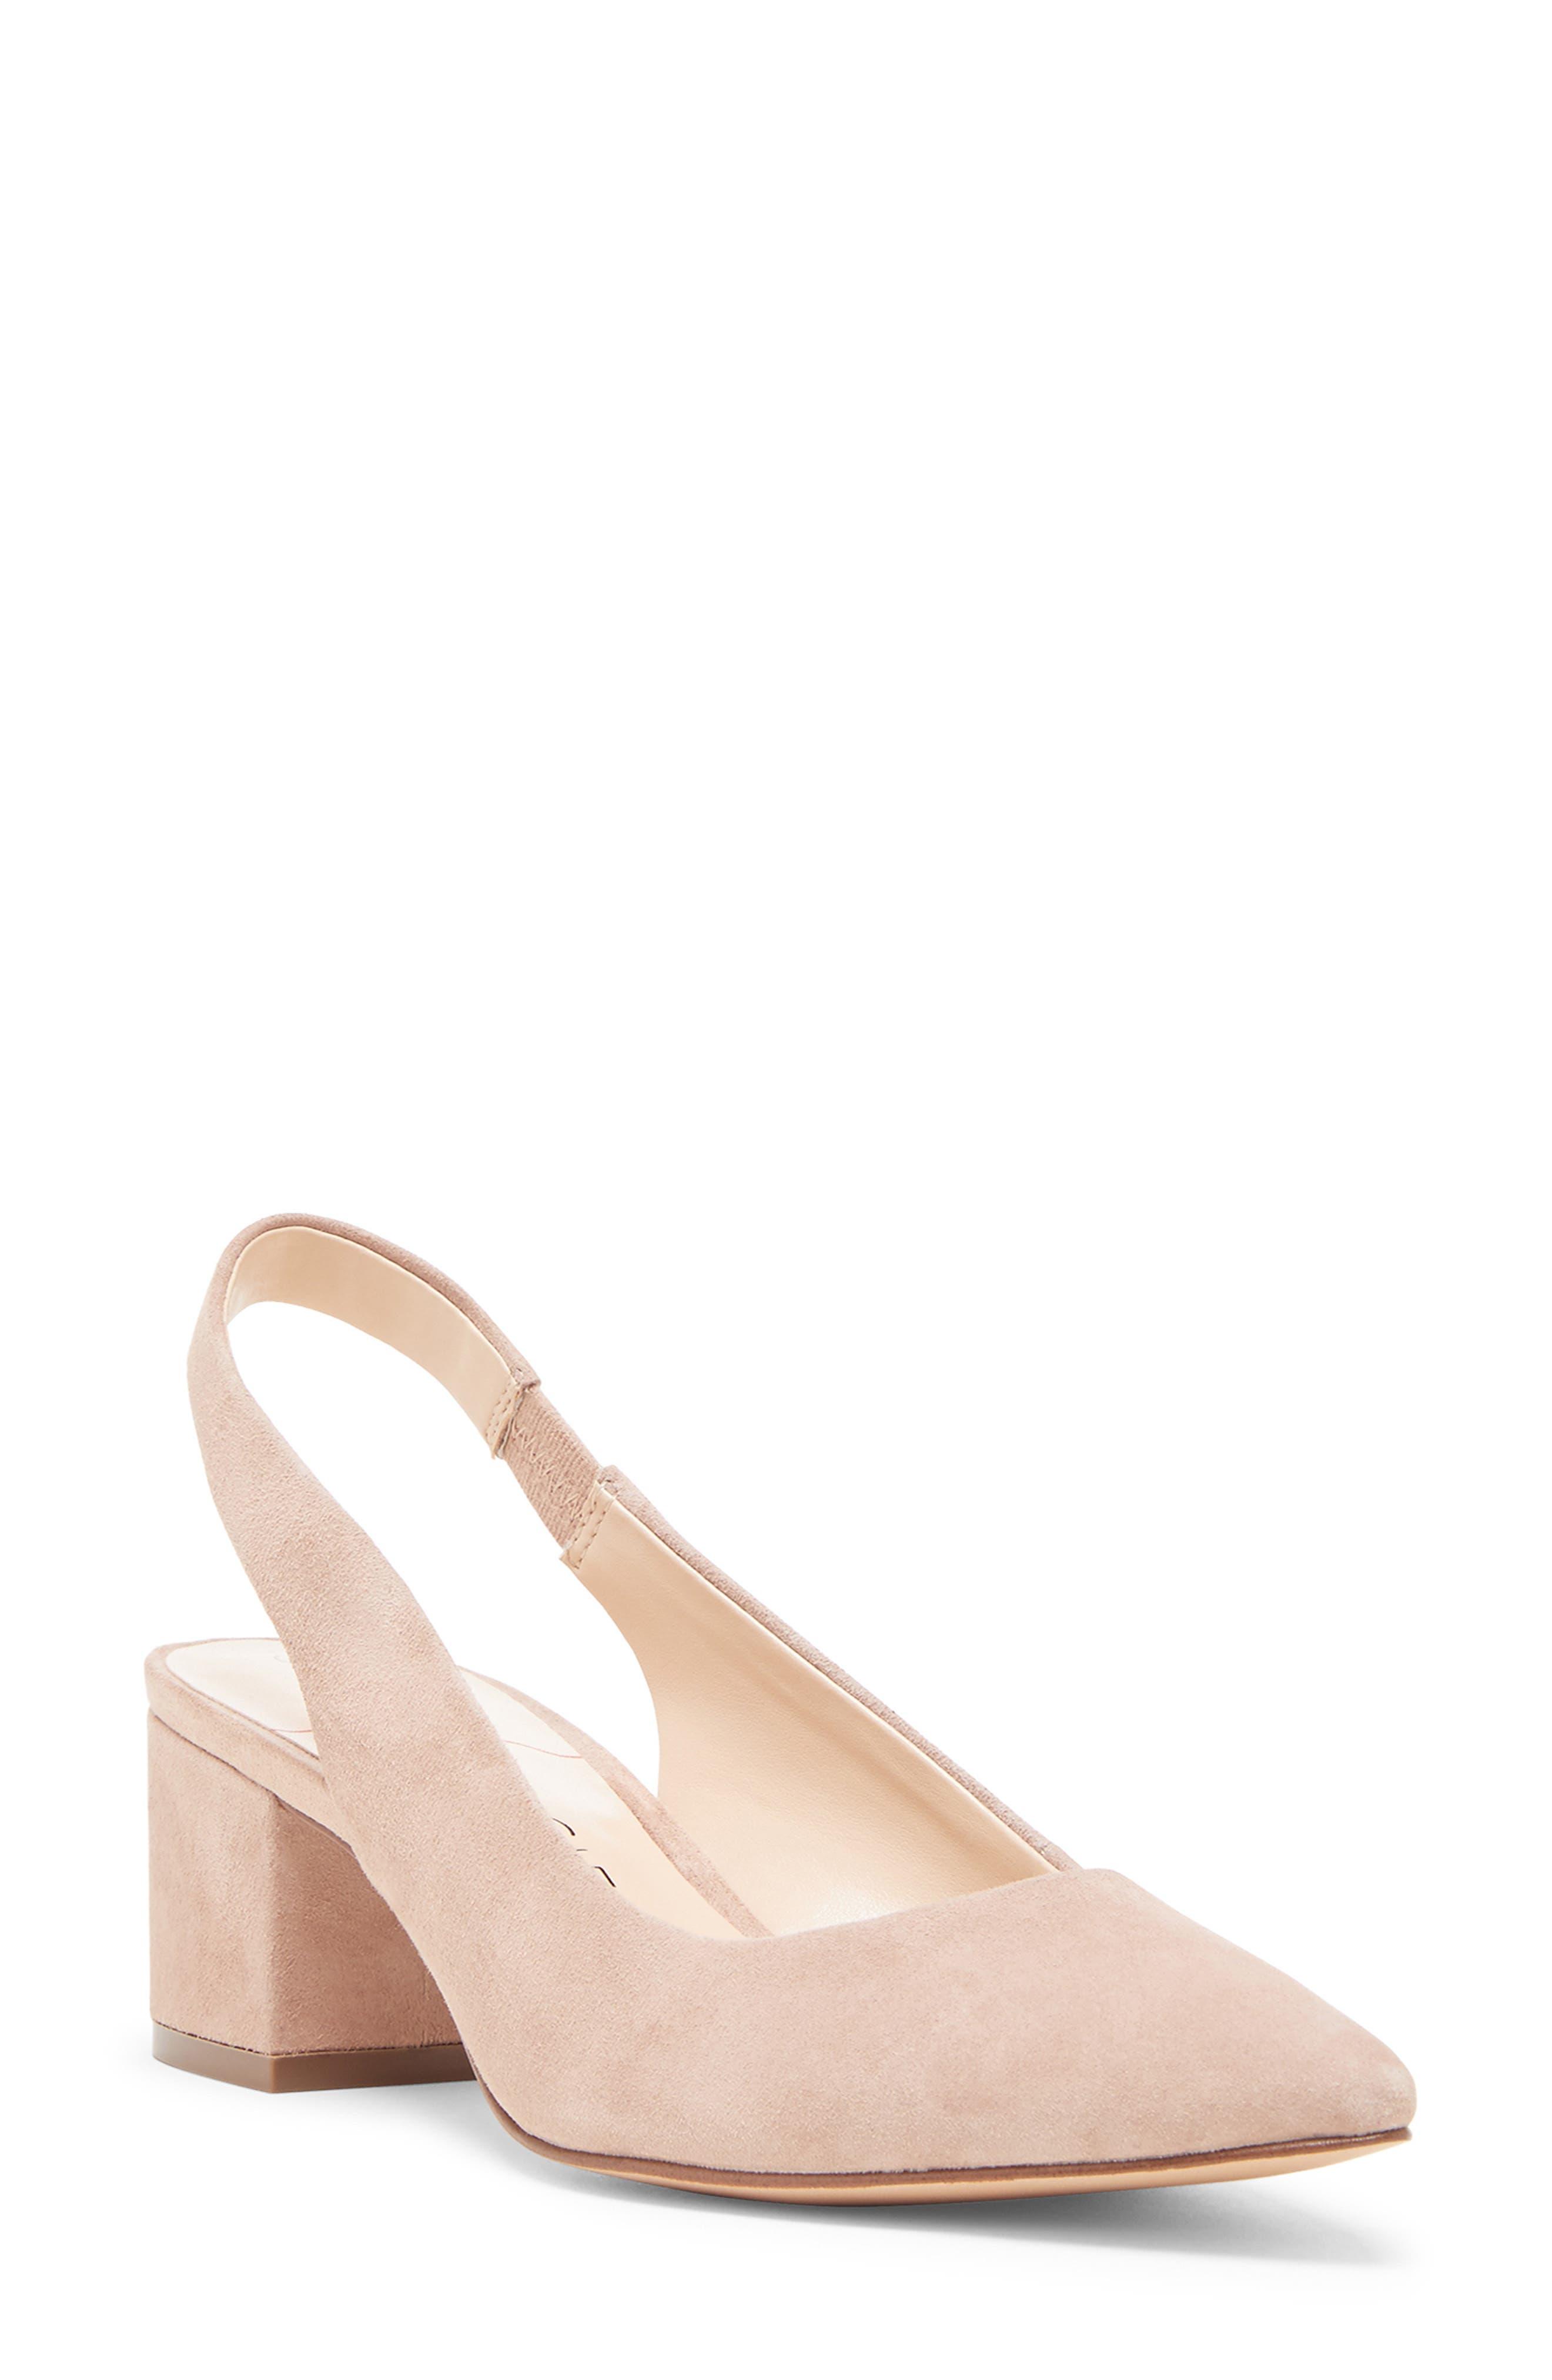 Sole Society Keilinah Slingback Pointy Toe Pump- Pink